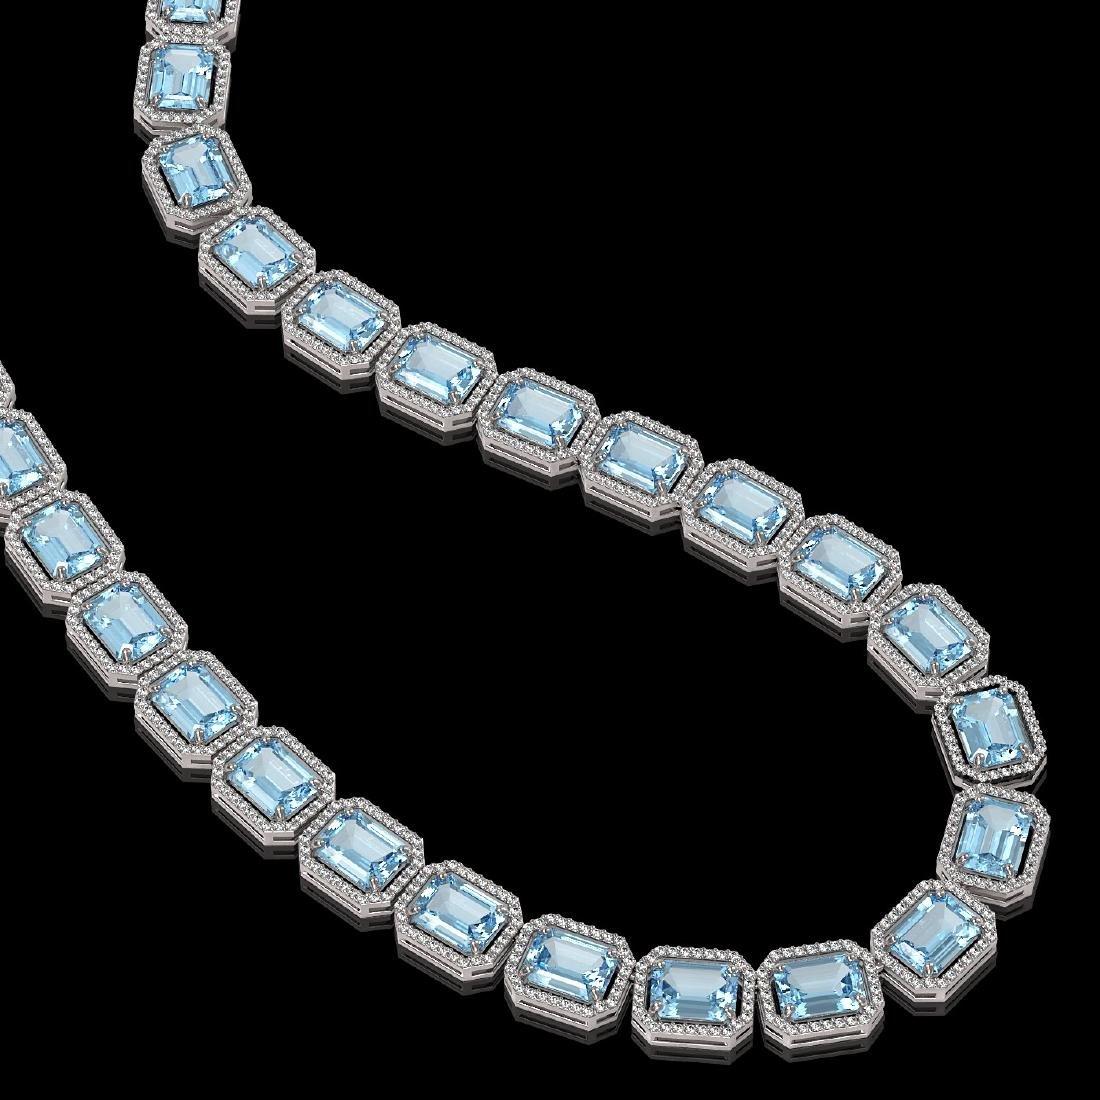 80.98 CTW Aquamarine & Diamond Halo Necklace 10K White - 2